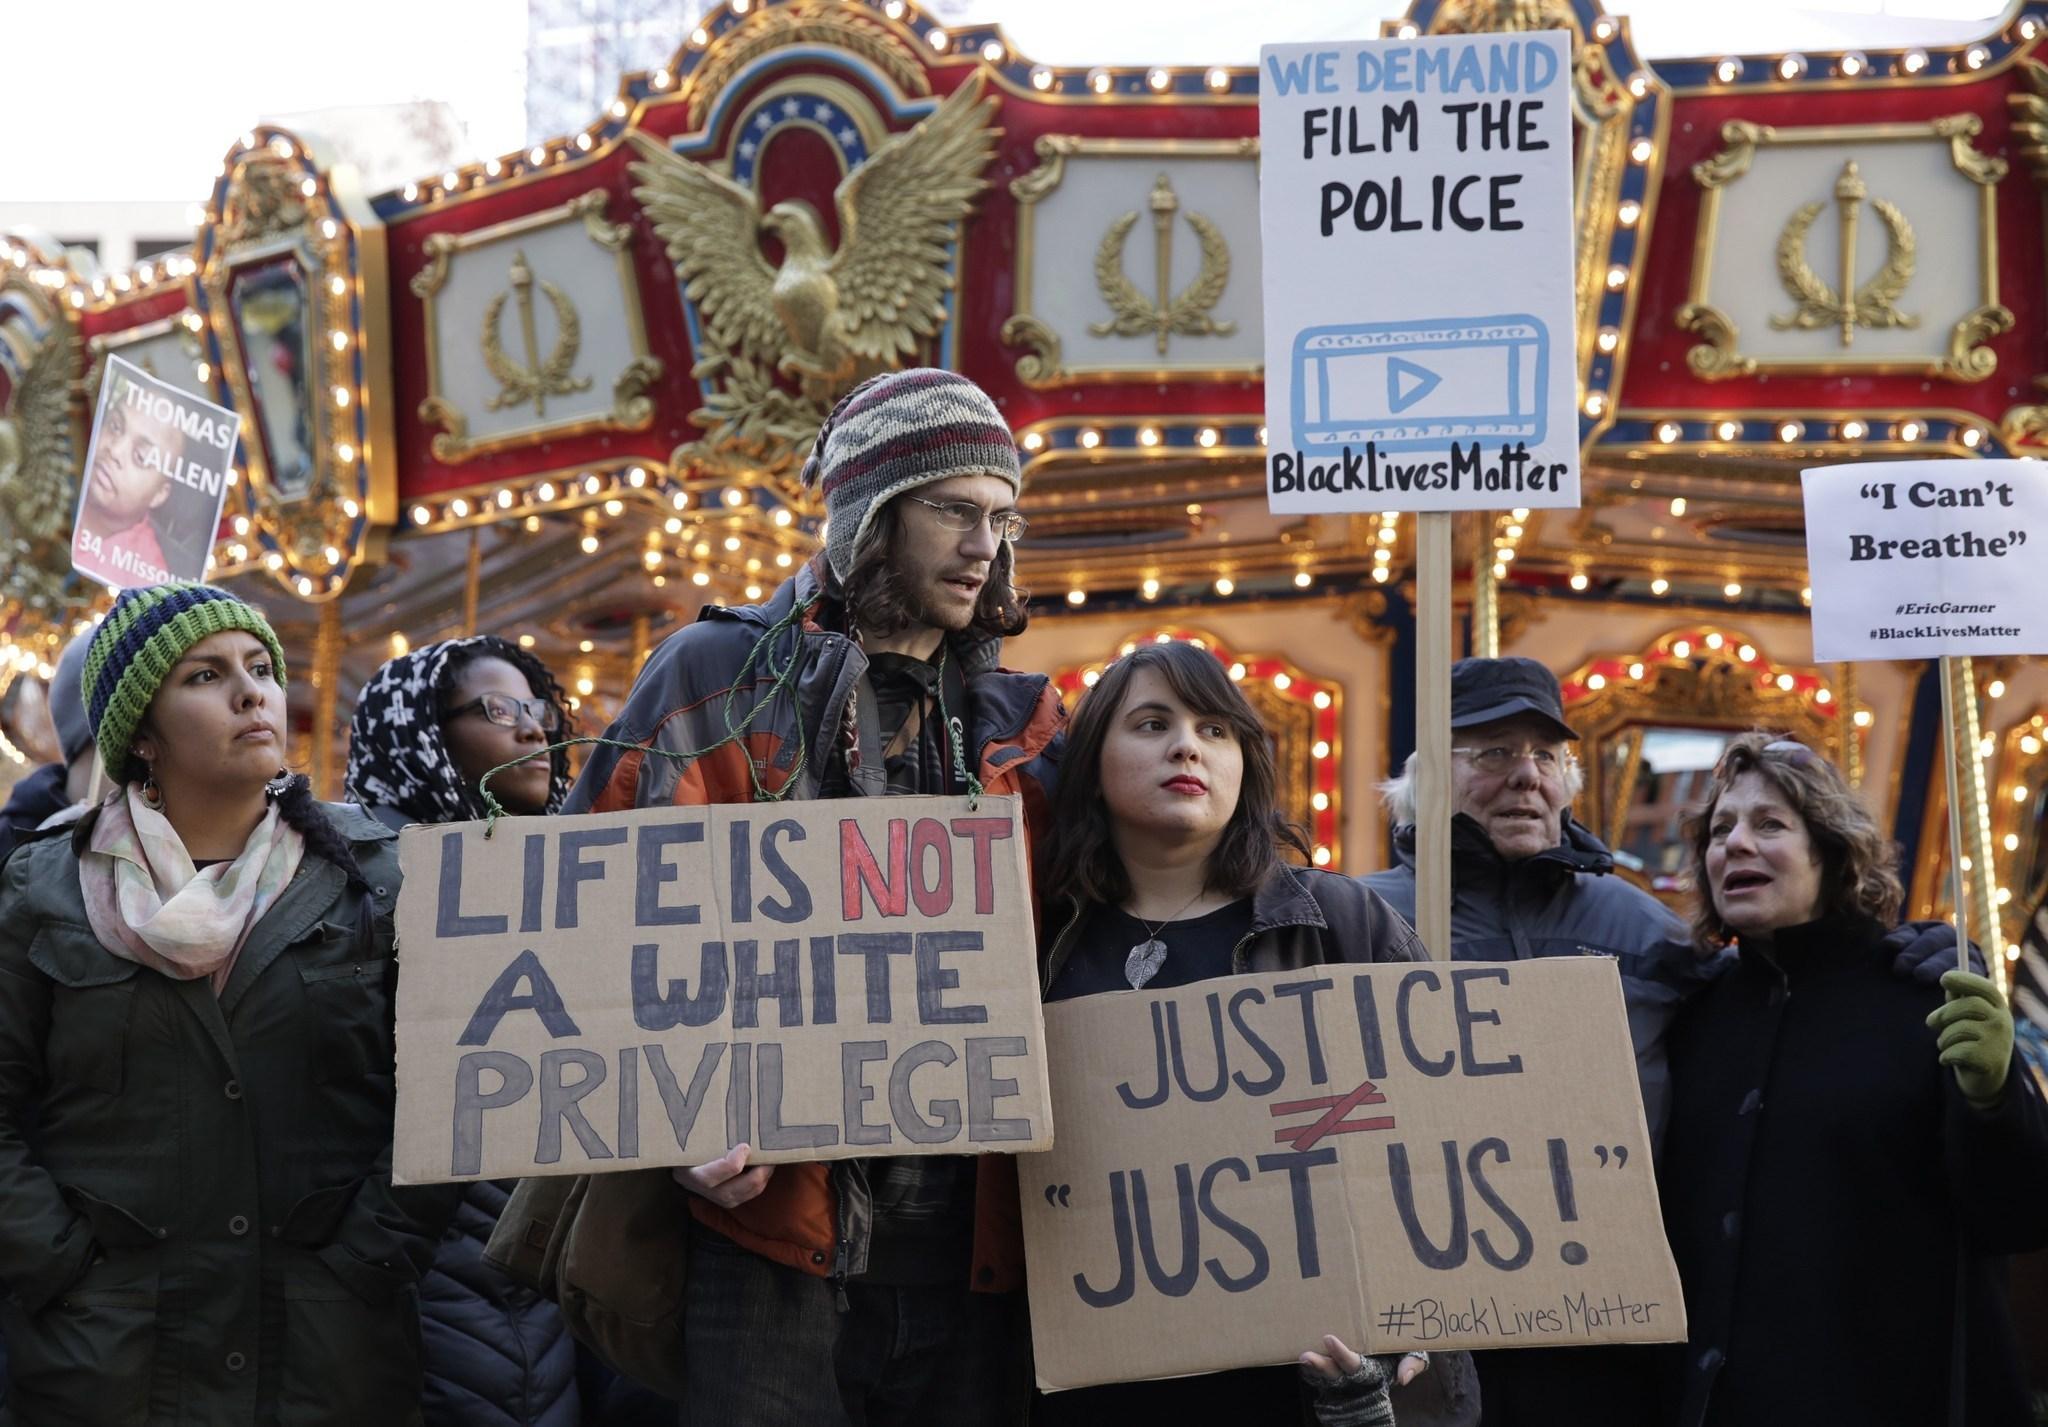 ct-white-privilege-is-real-20160125.jpg